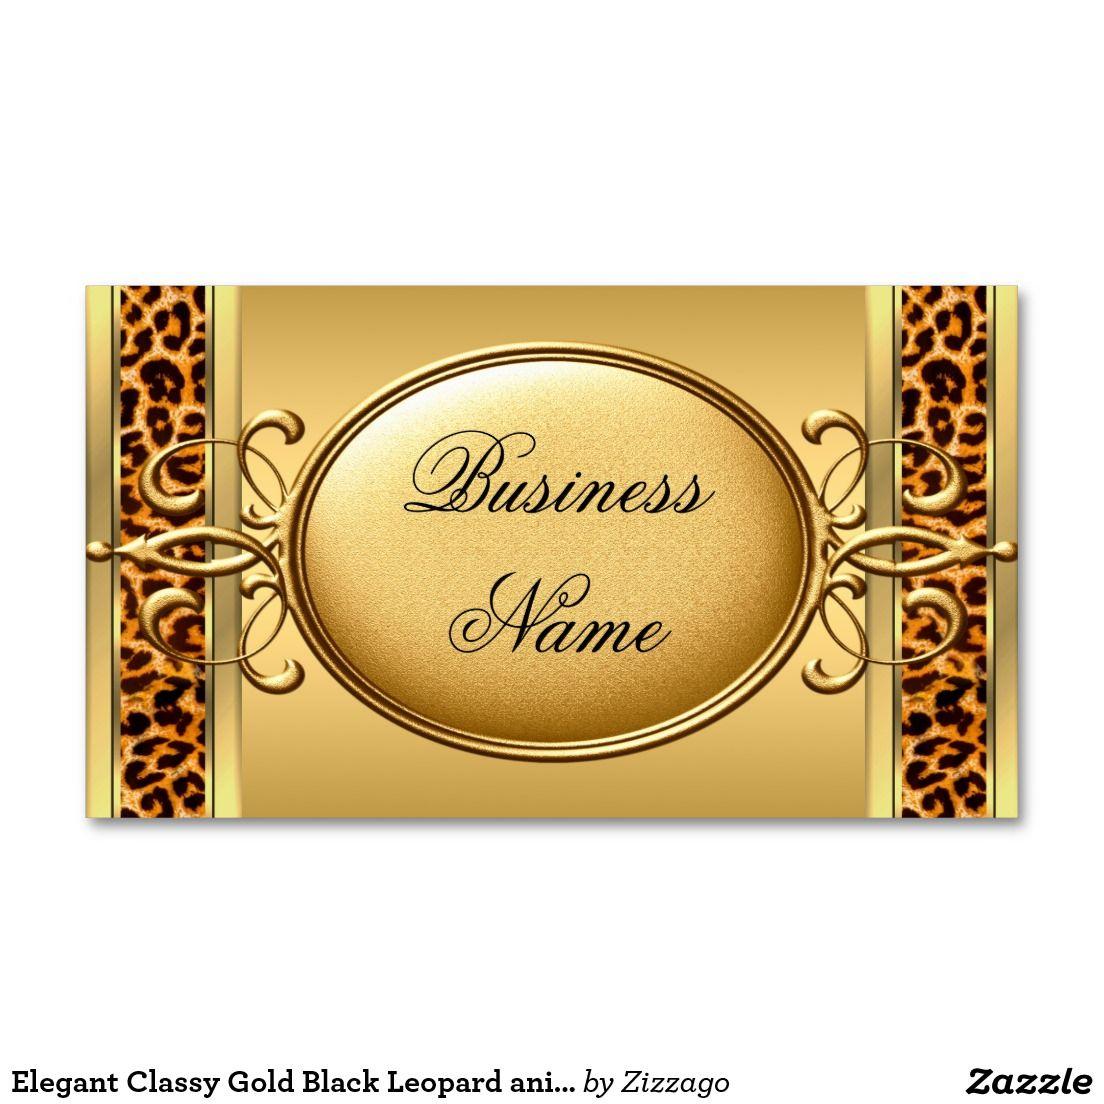 Elegant Classy Gold Black Leopard animal print 2 Business Card ...